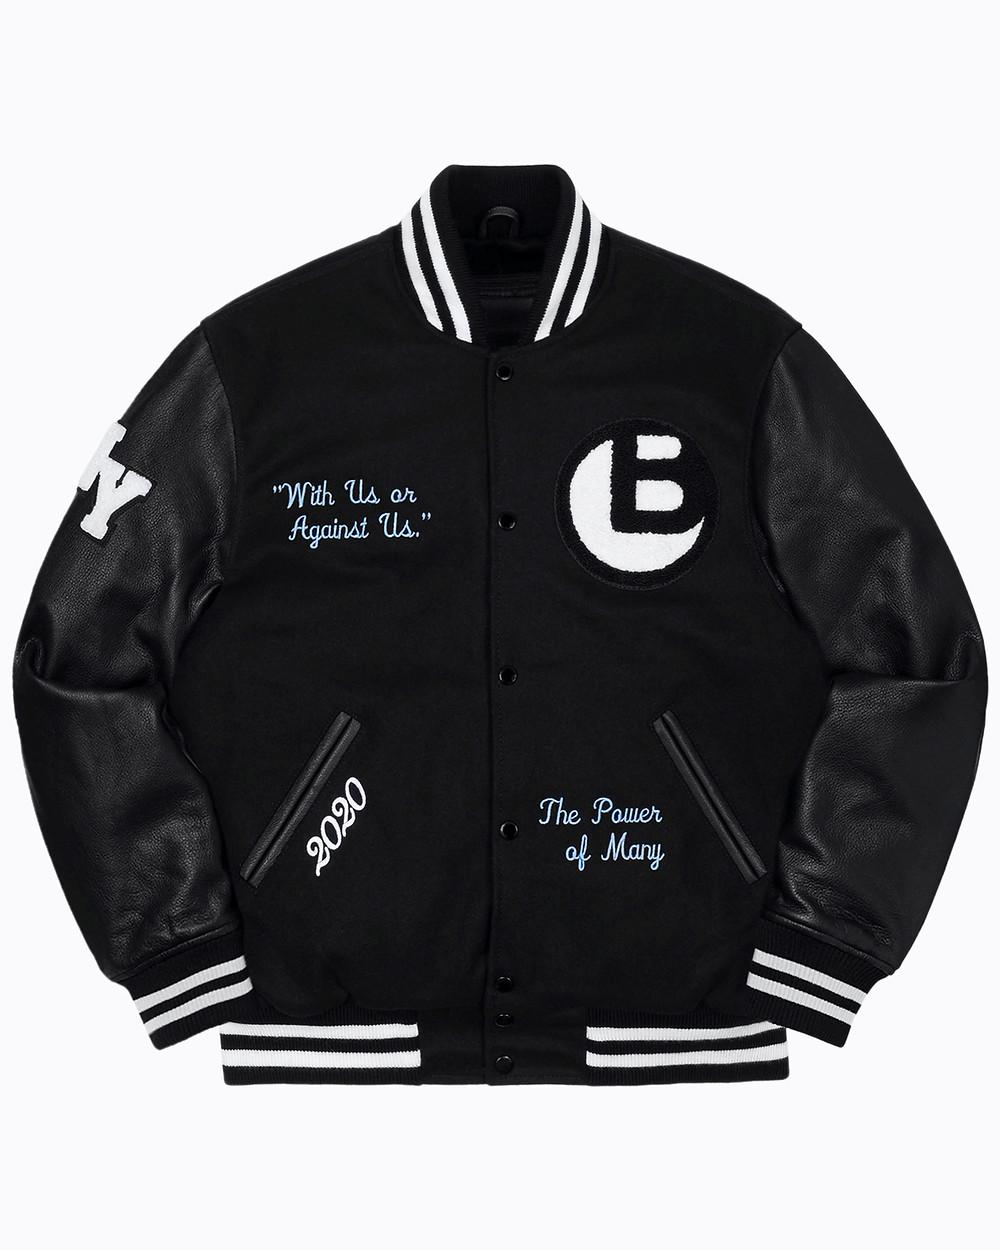 Brigade 2020 Varsity Jacket